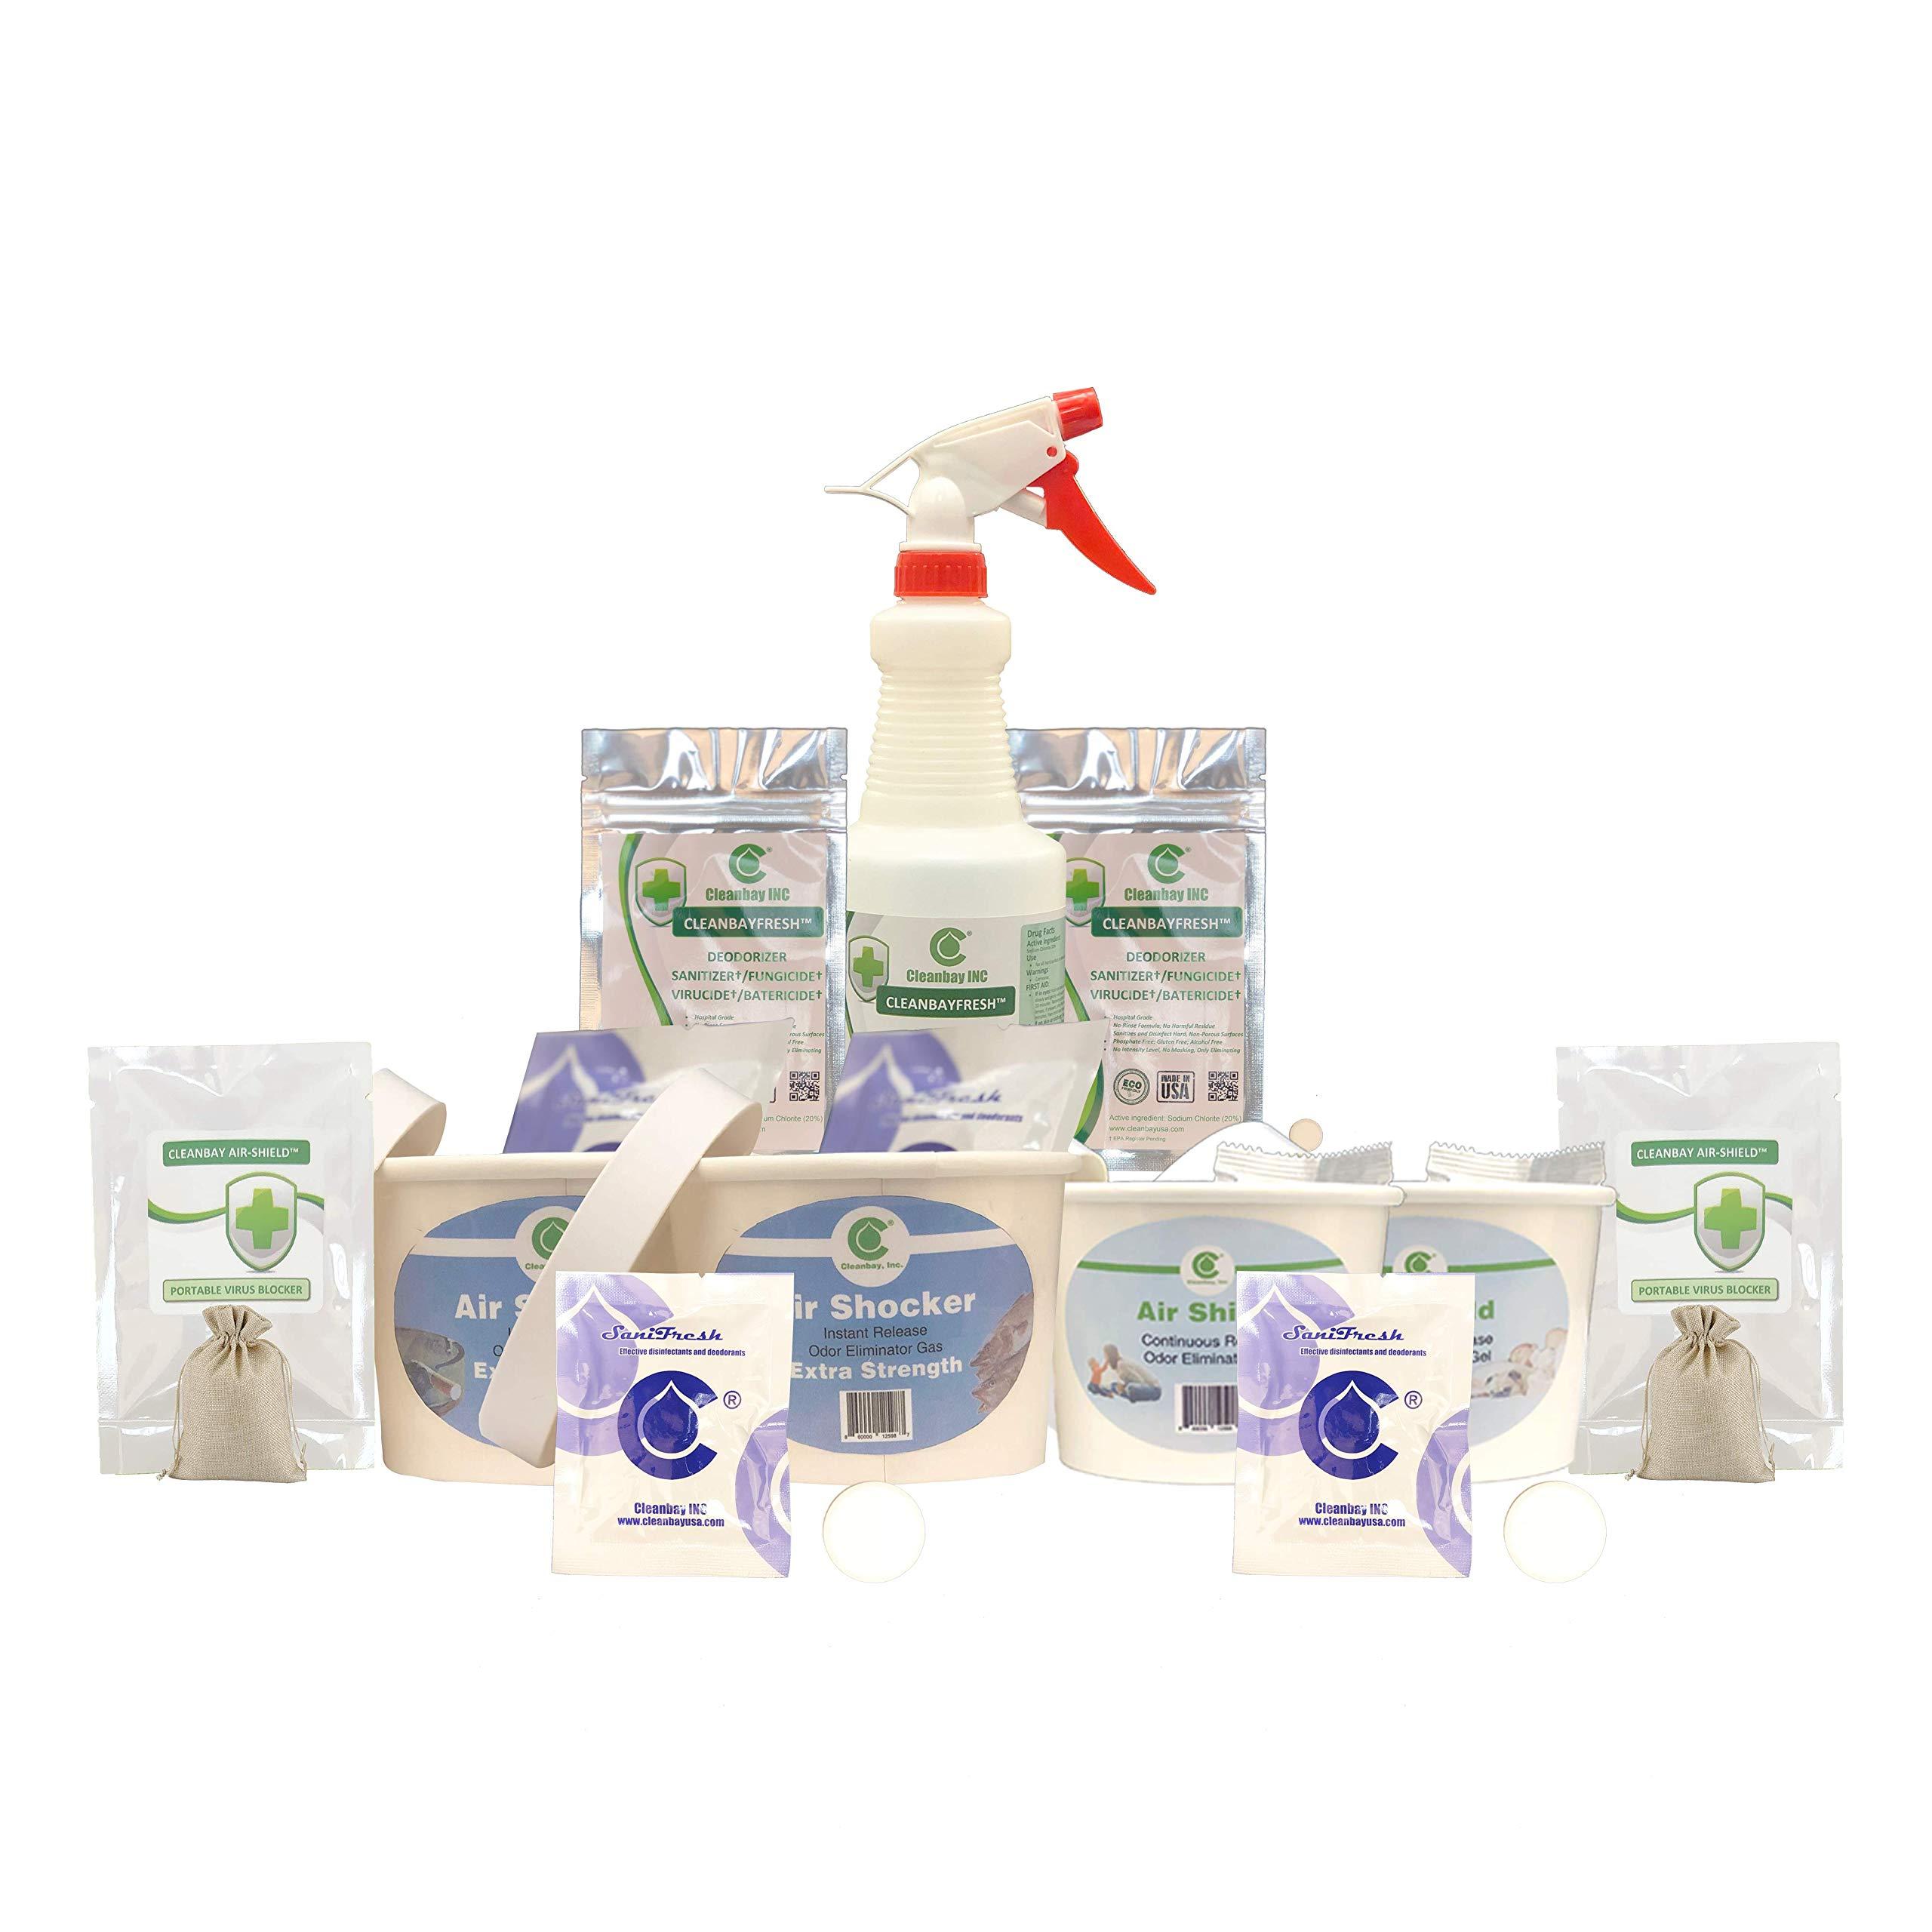 #1 Most Effective Odor Eliminator & Air Freshener - Effective Commercial Deodorizer   Professional Odor Eliminator   Eliminate Odors at The Source   11-Piece Bundle